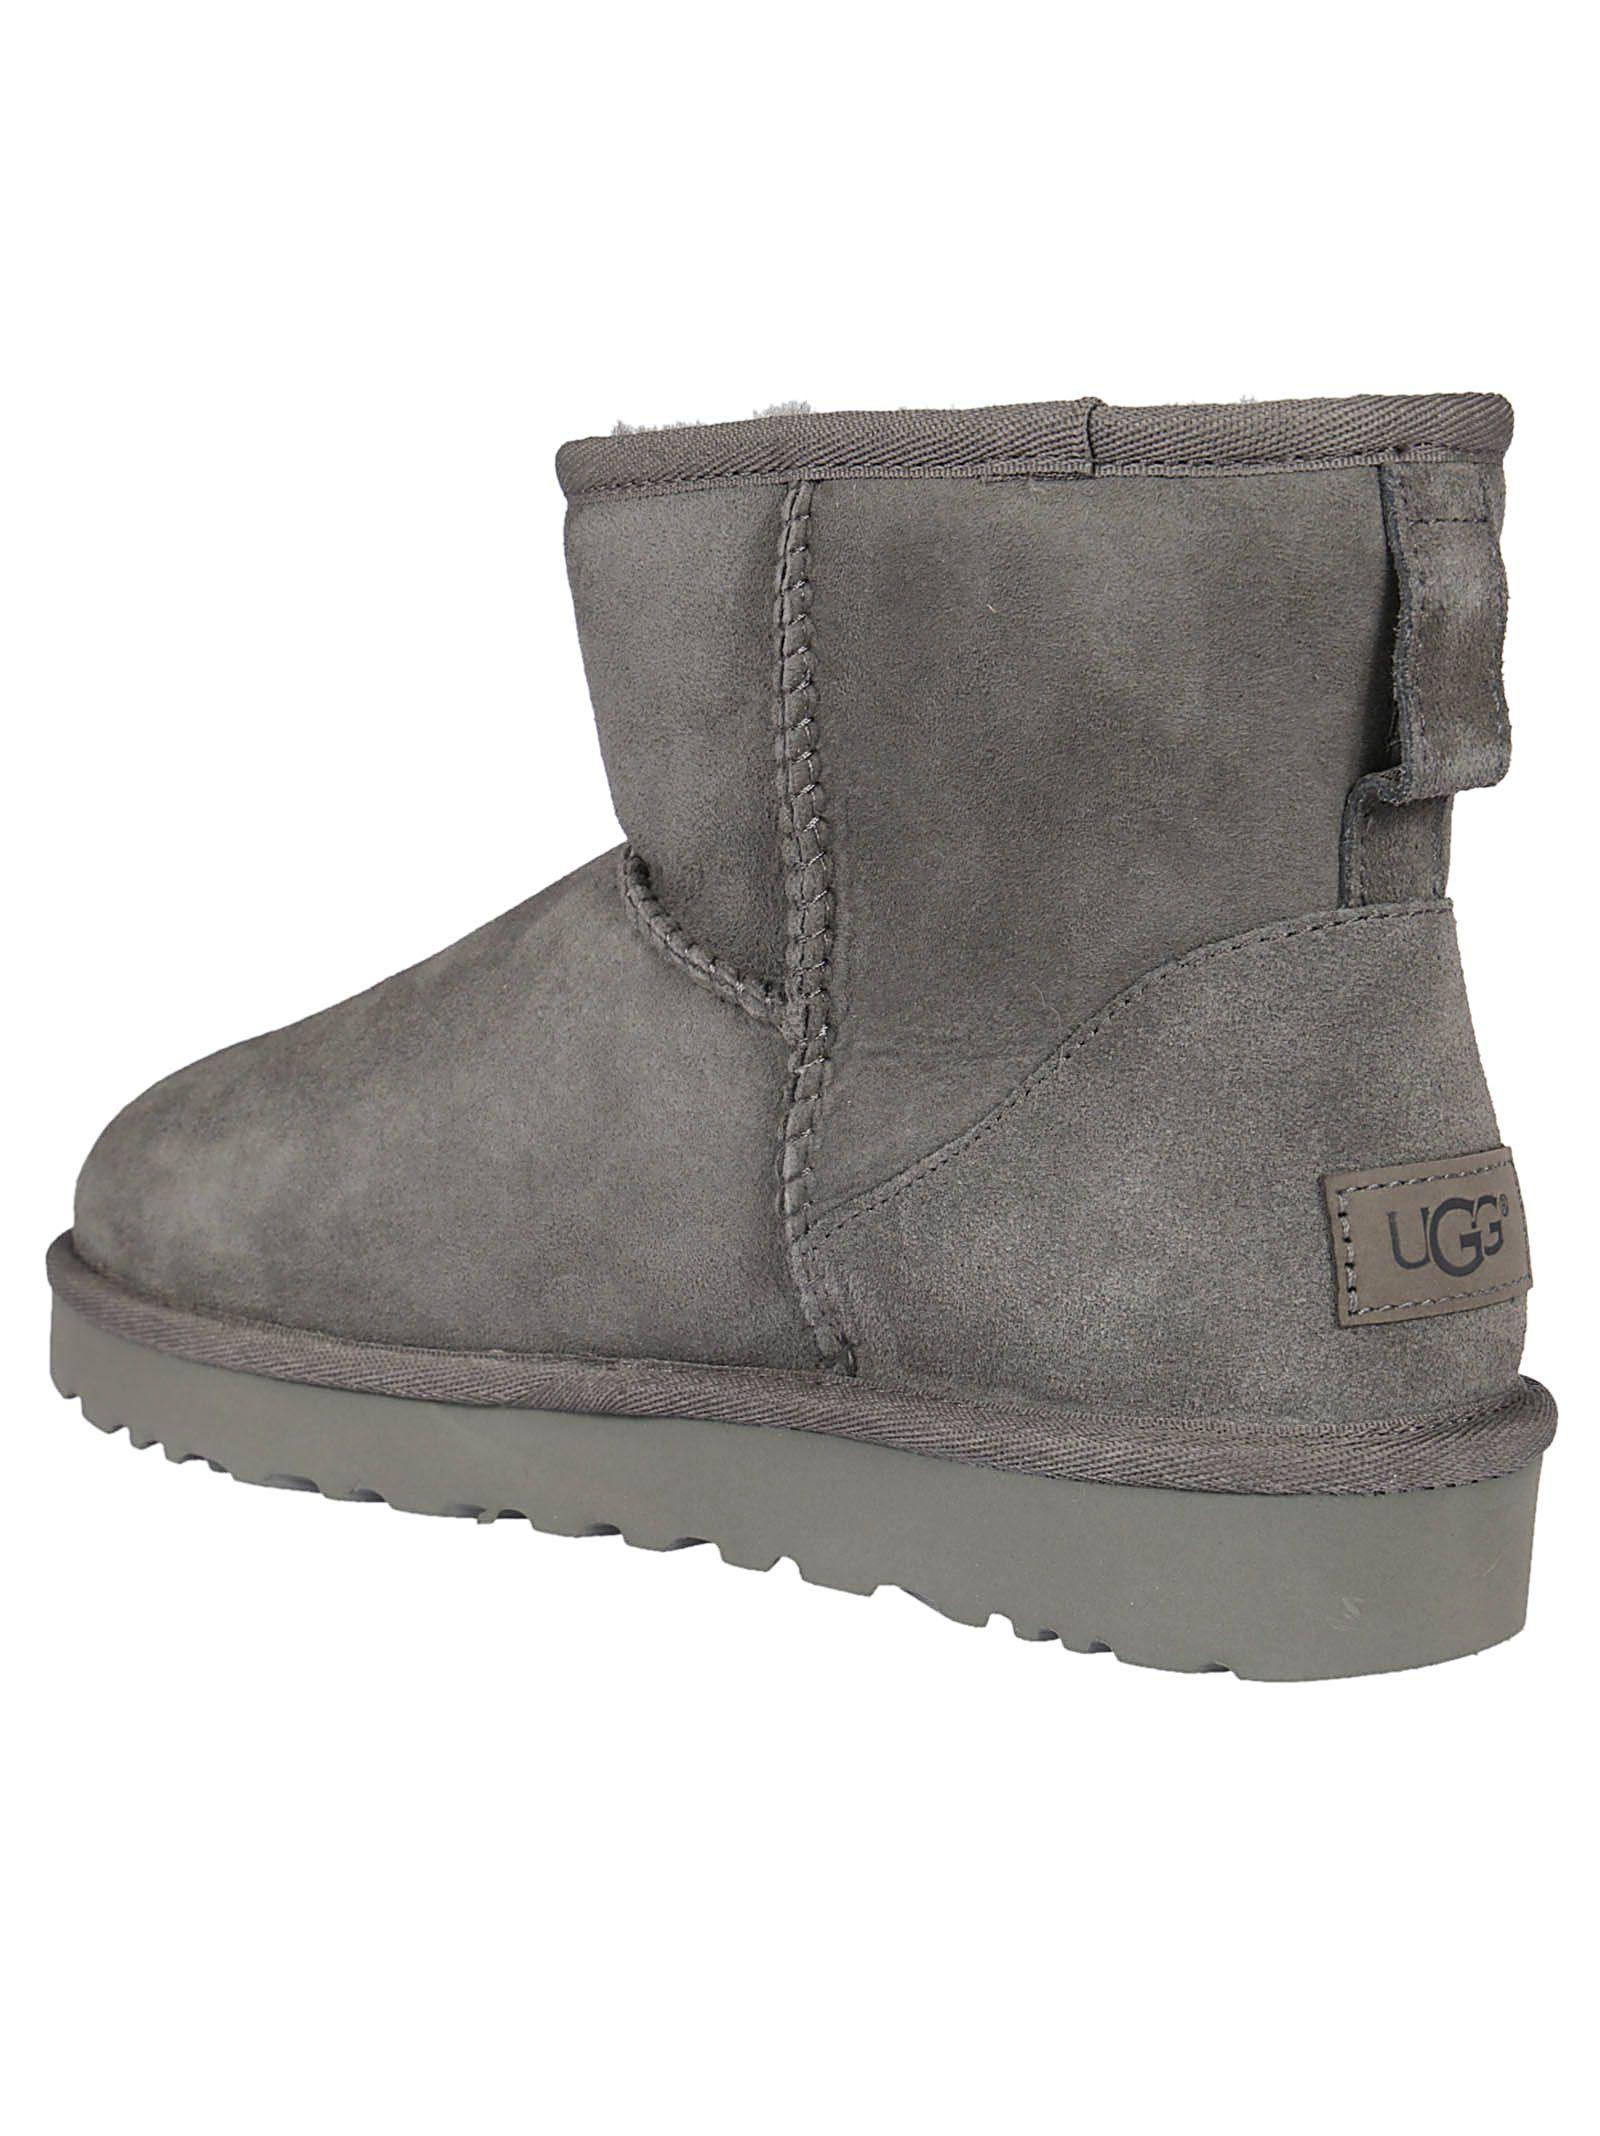 b2c72d4de9f ireland ugg australia classic mini ankle boots black 6c672 25d89